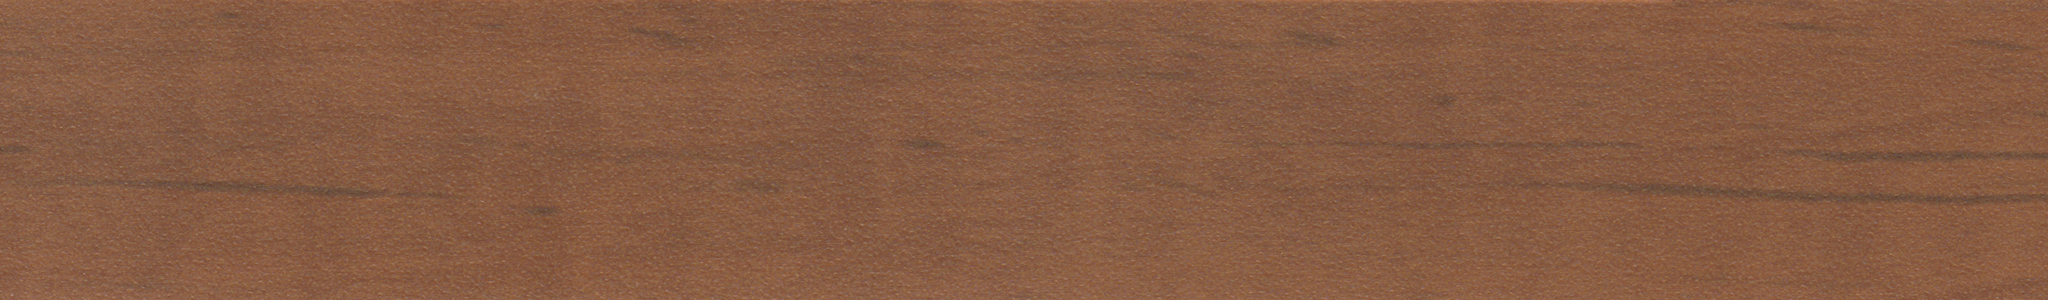 HD 22063 ABS Kante Dekor Birne perl